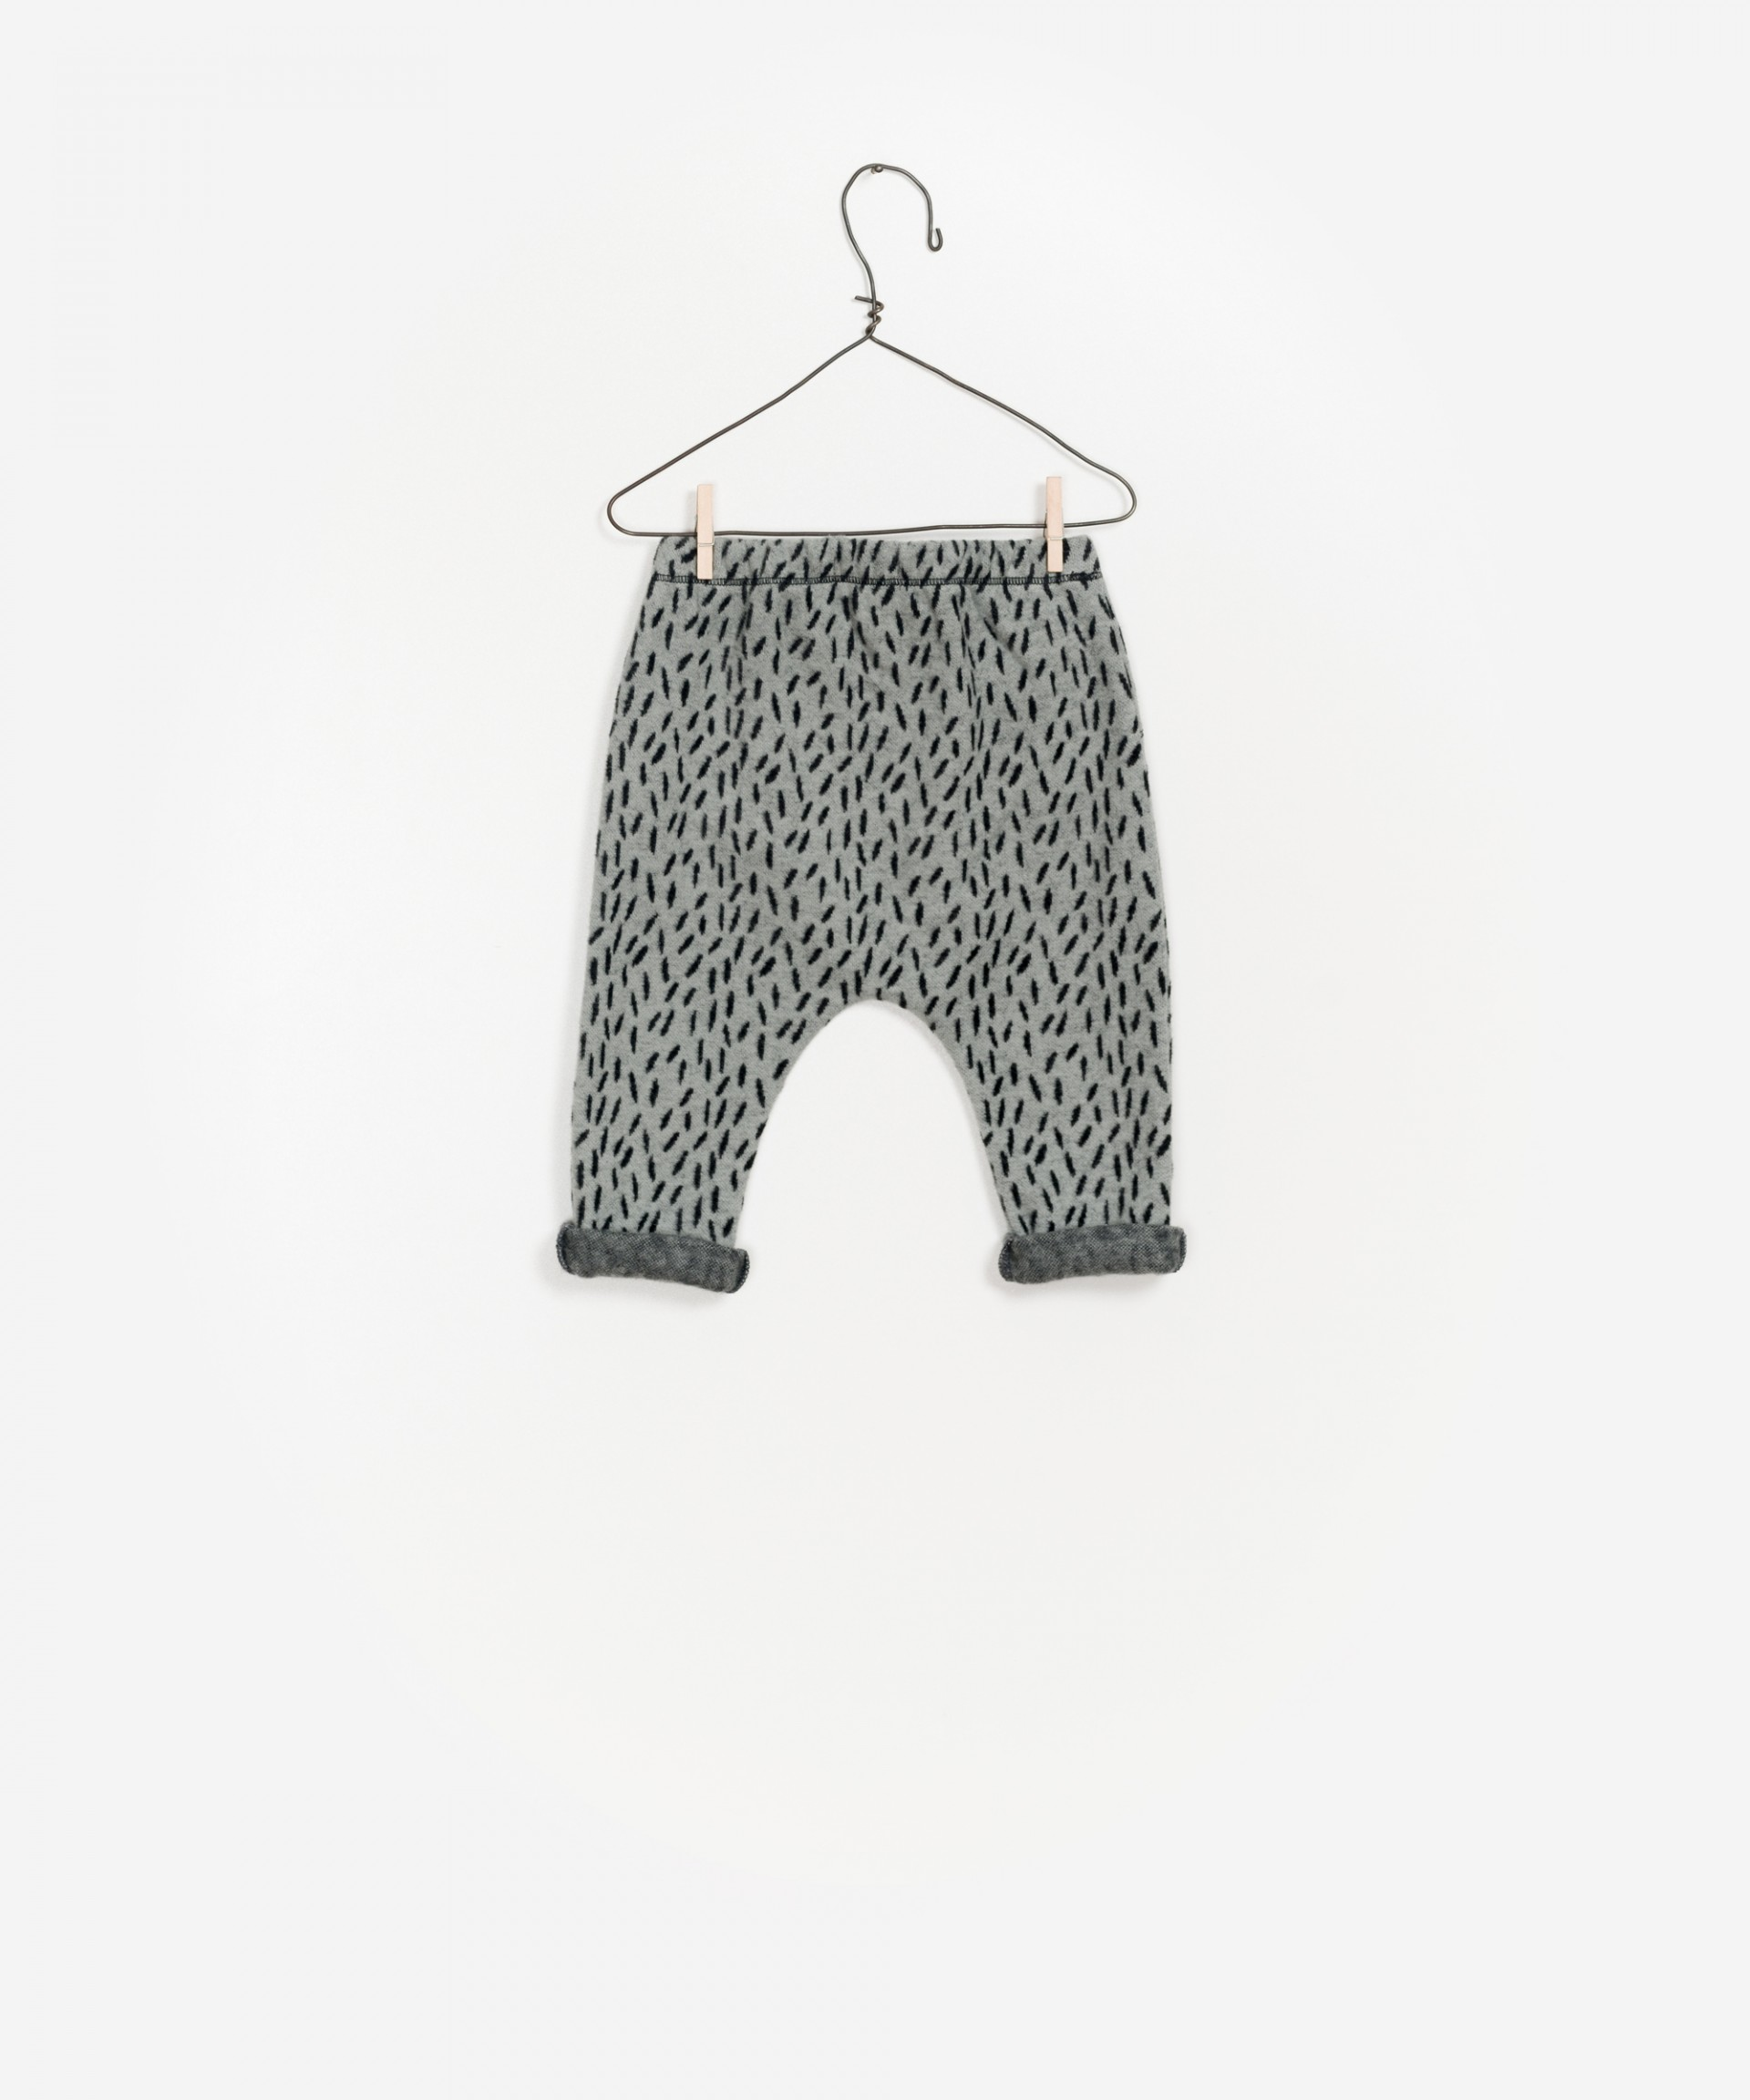 Pantaloni jacquard in cotone biologico 100%